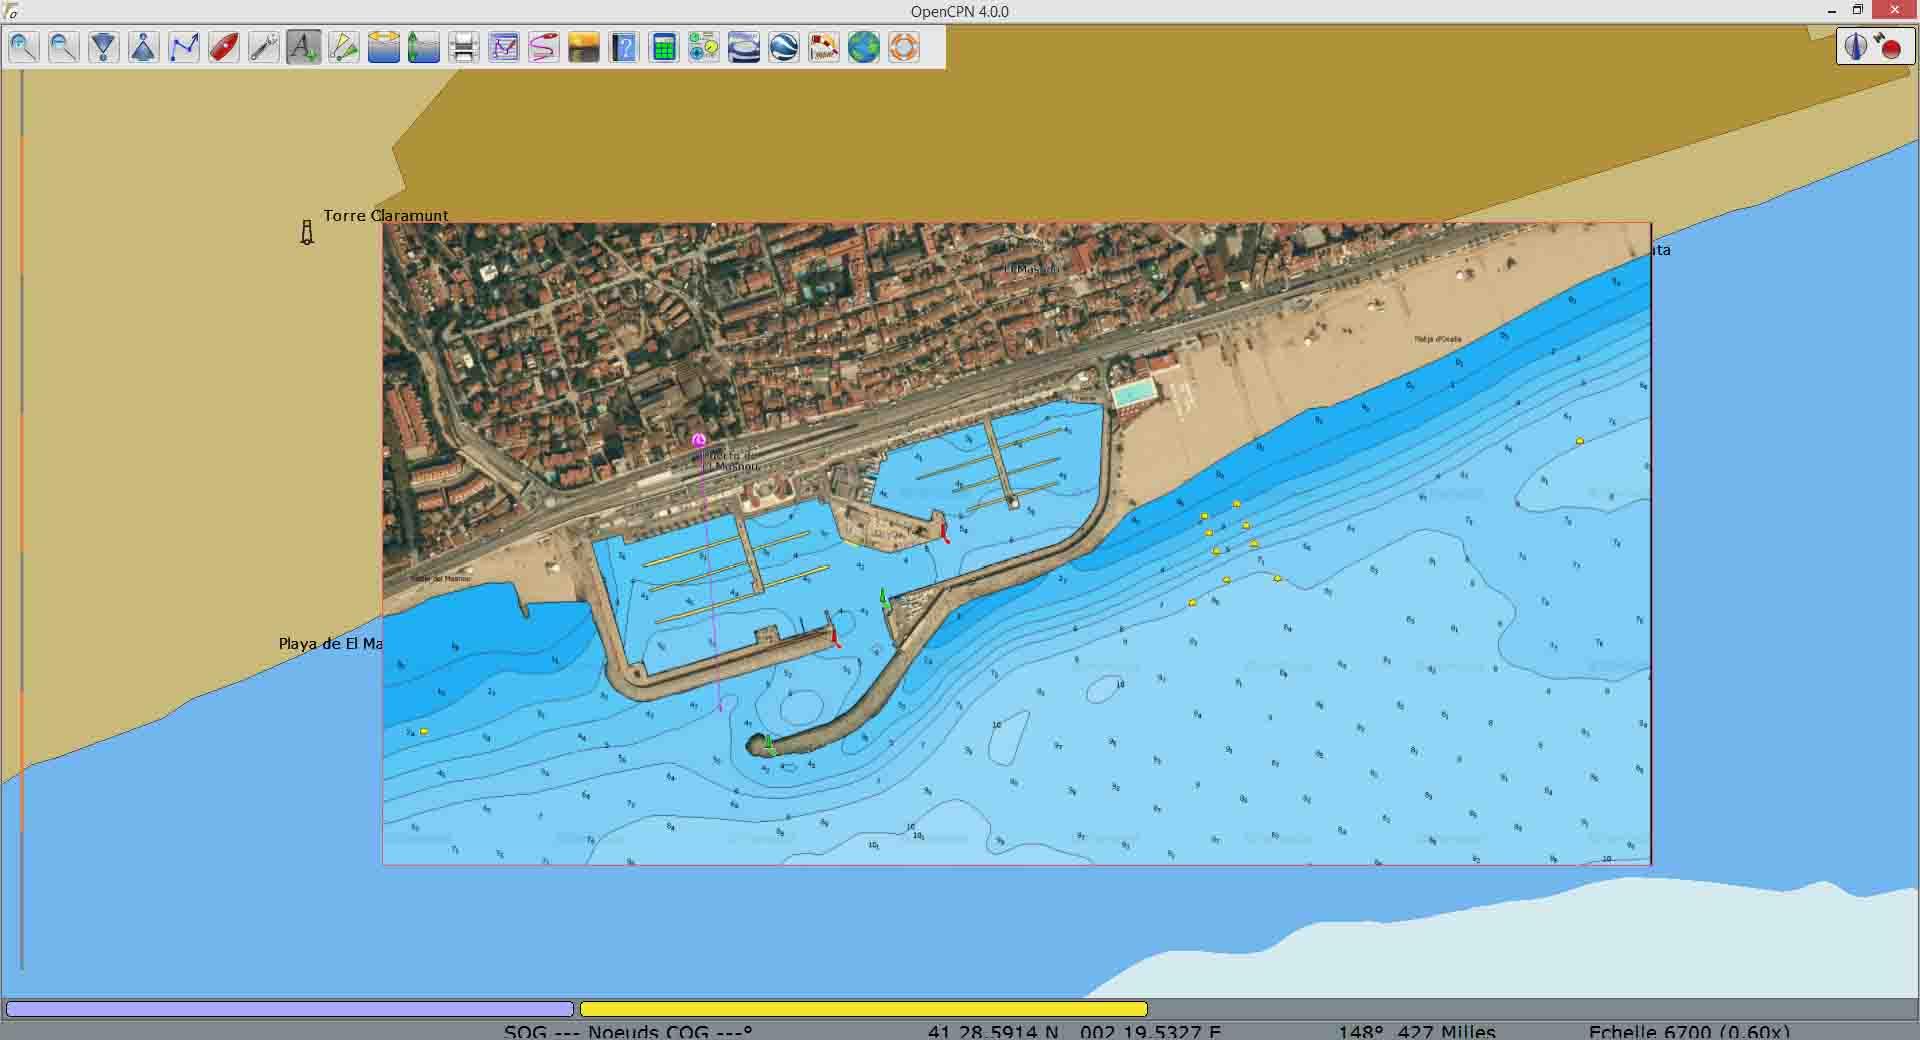 La cartographie de ponton